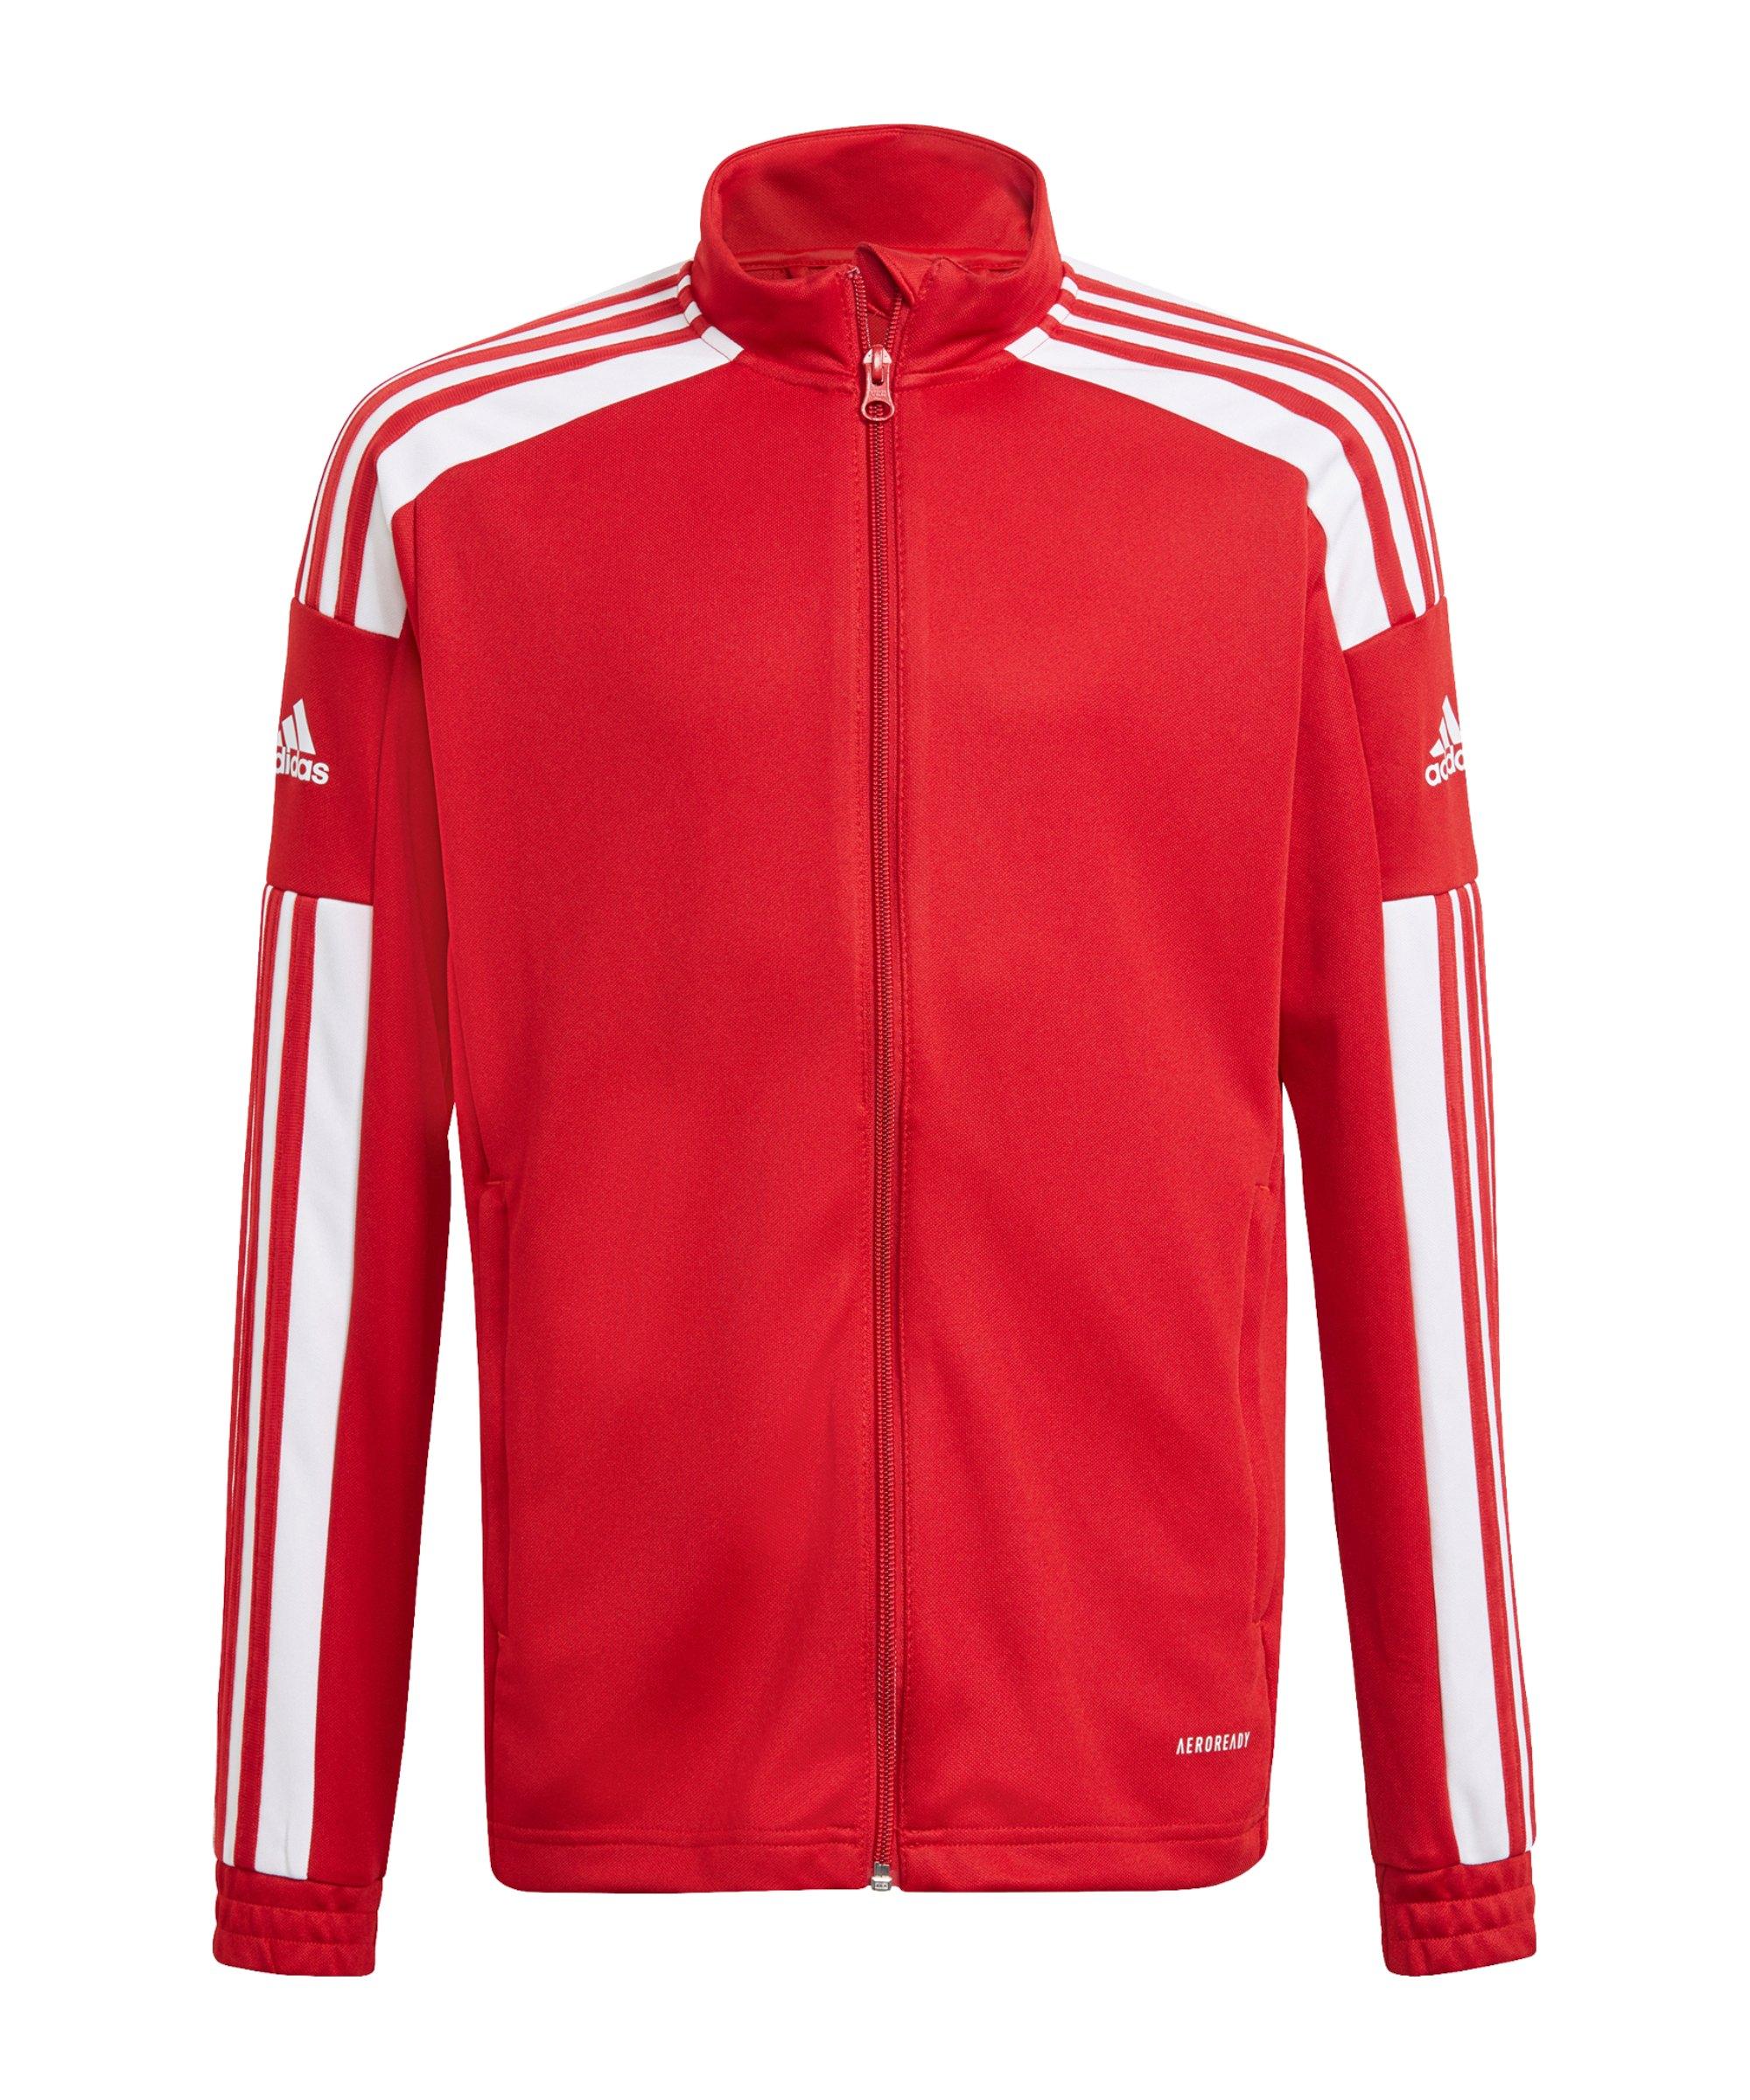 adidas Squadra 21 Trainingsjacke Kids Rot Weiss - rot